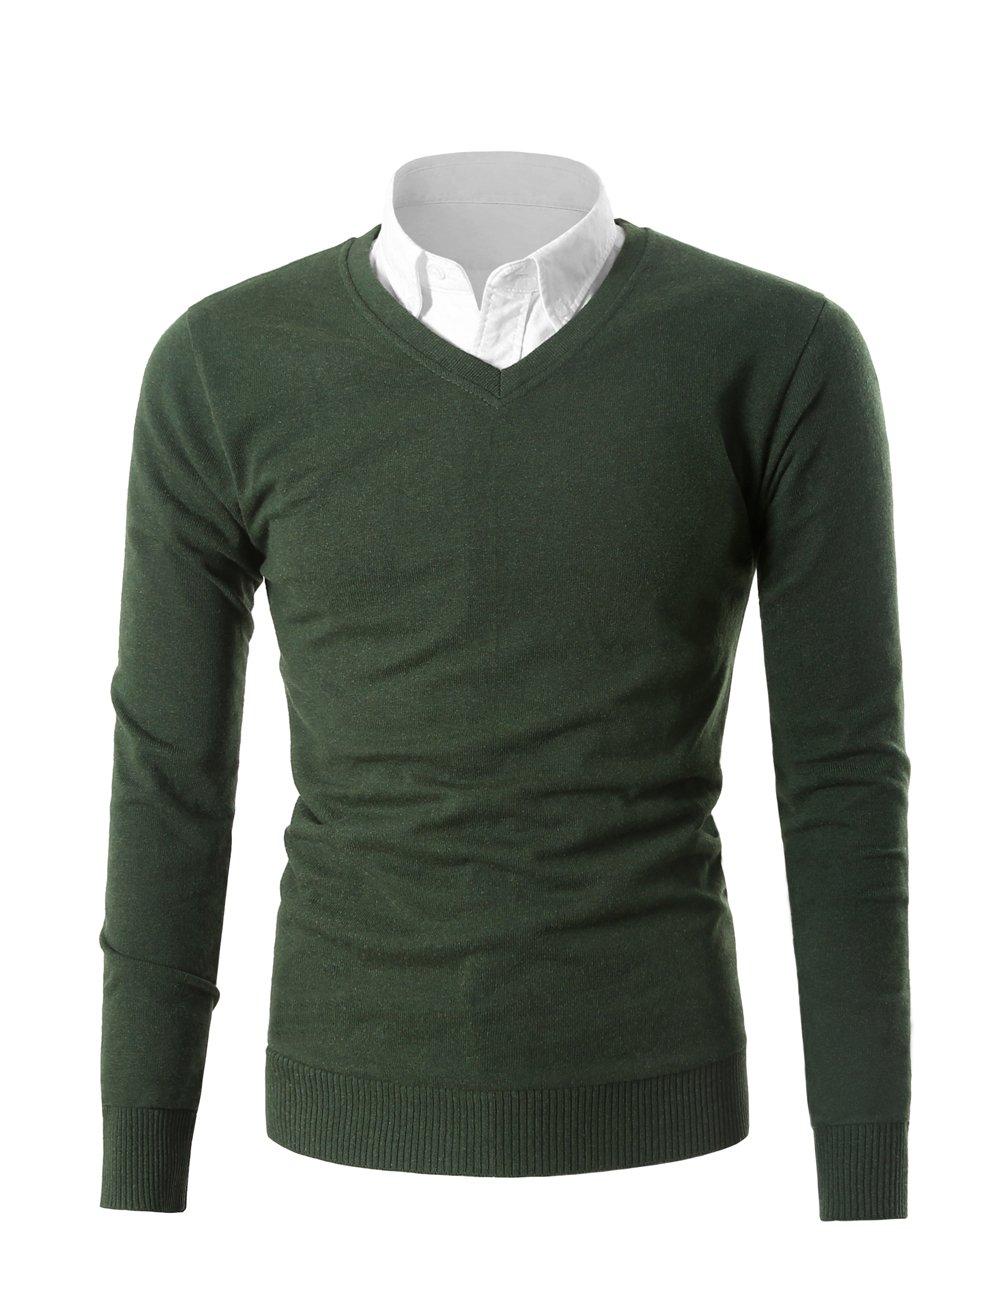 Mesahara Mens Casual Slim Fit Knit V-Neck Pullover Sweater (XL, Green)